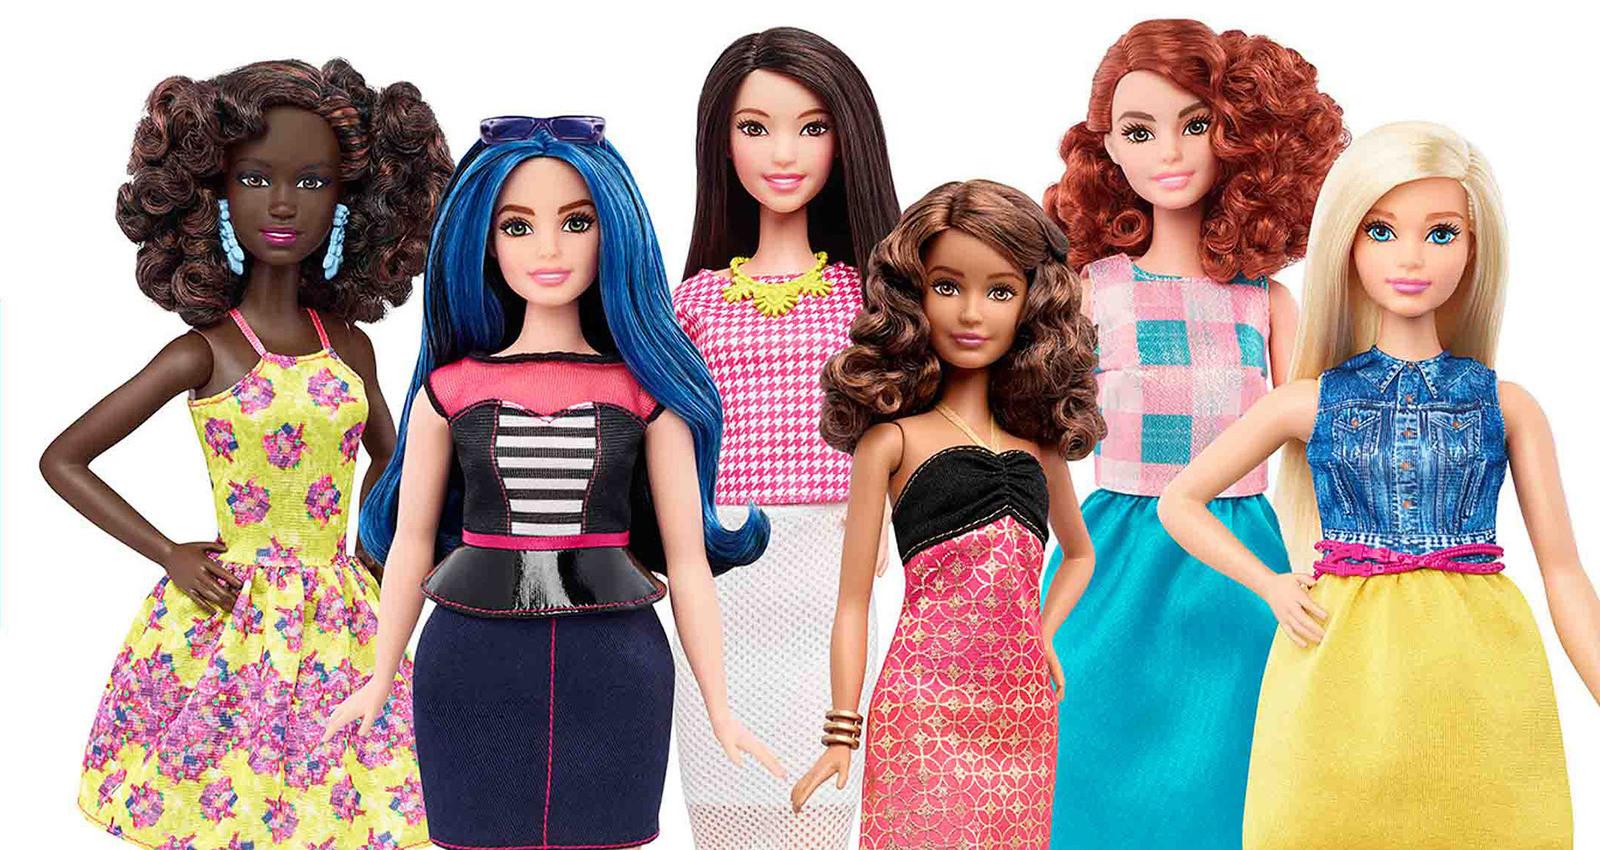 Barbie Evolve the Doll